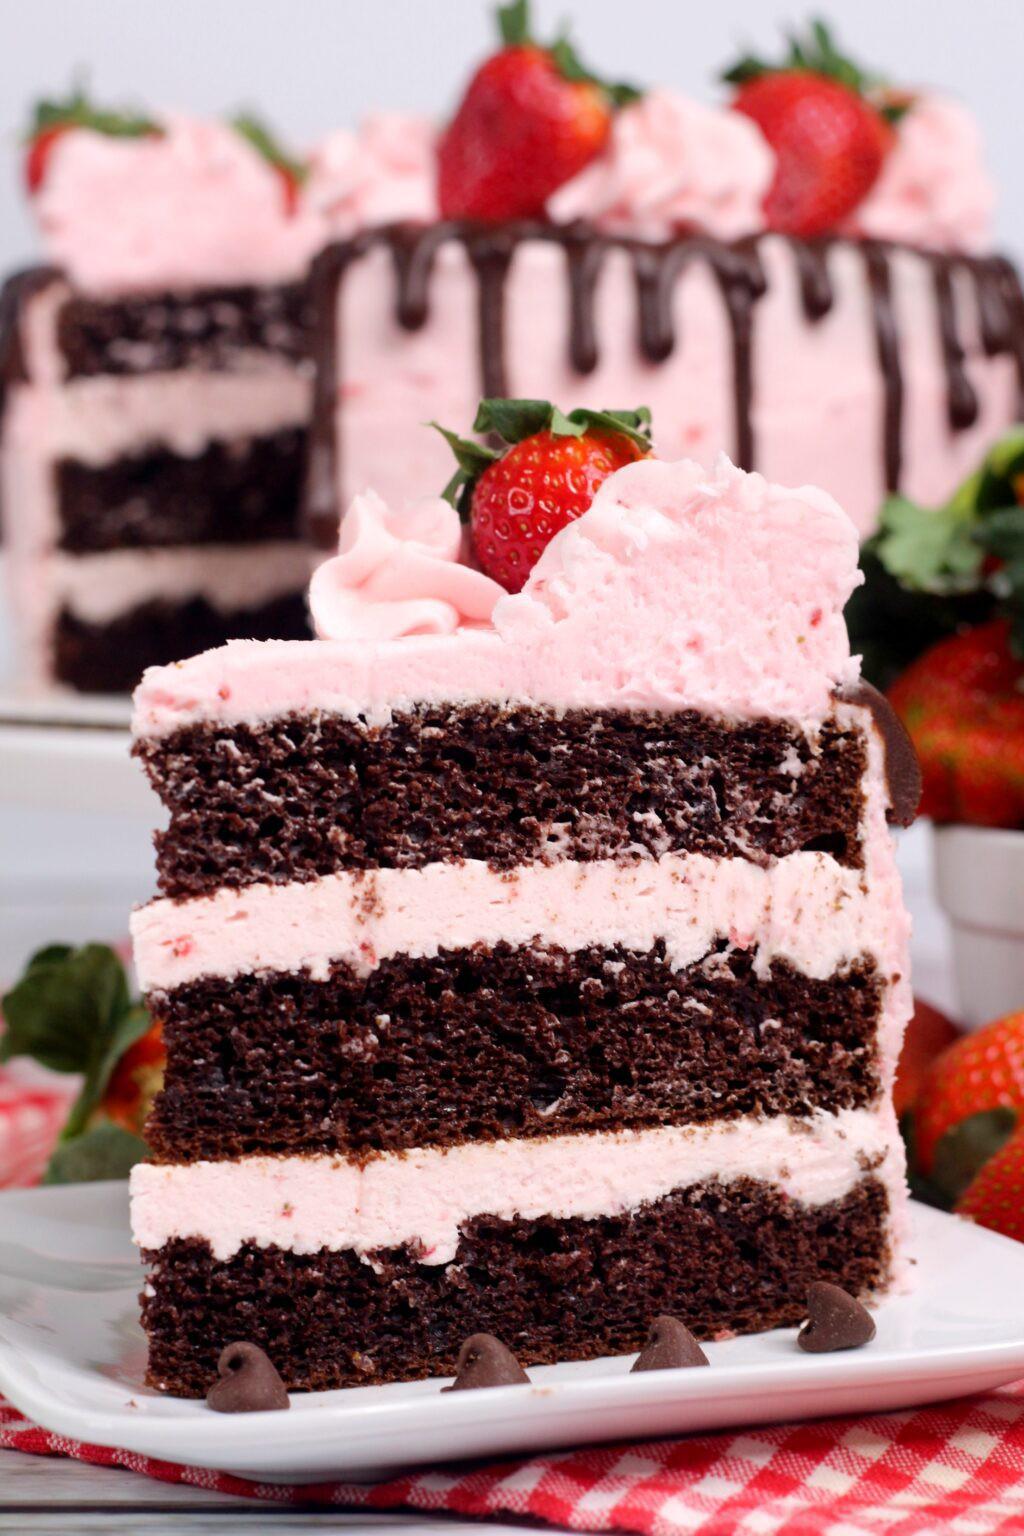 Chocolate Kahlua Cake with Strawberry Buttercream Frosting  Lezlie Piggott-Webster  Copy Me That